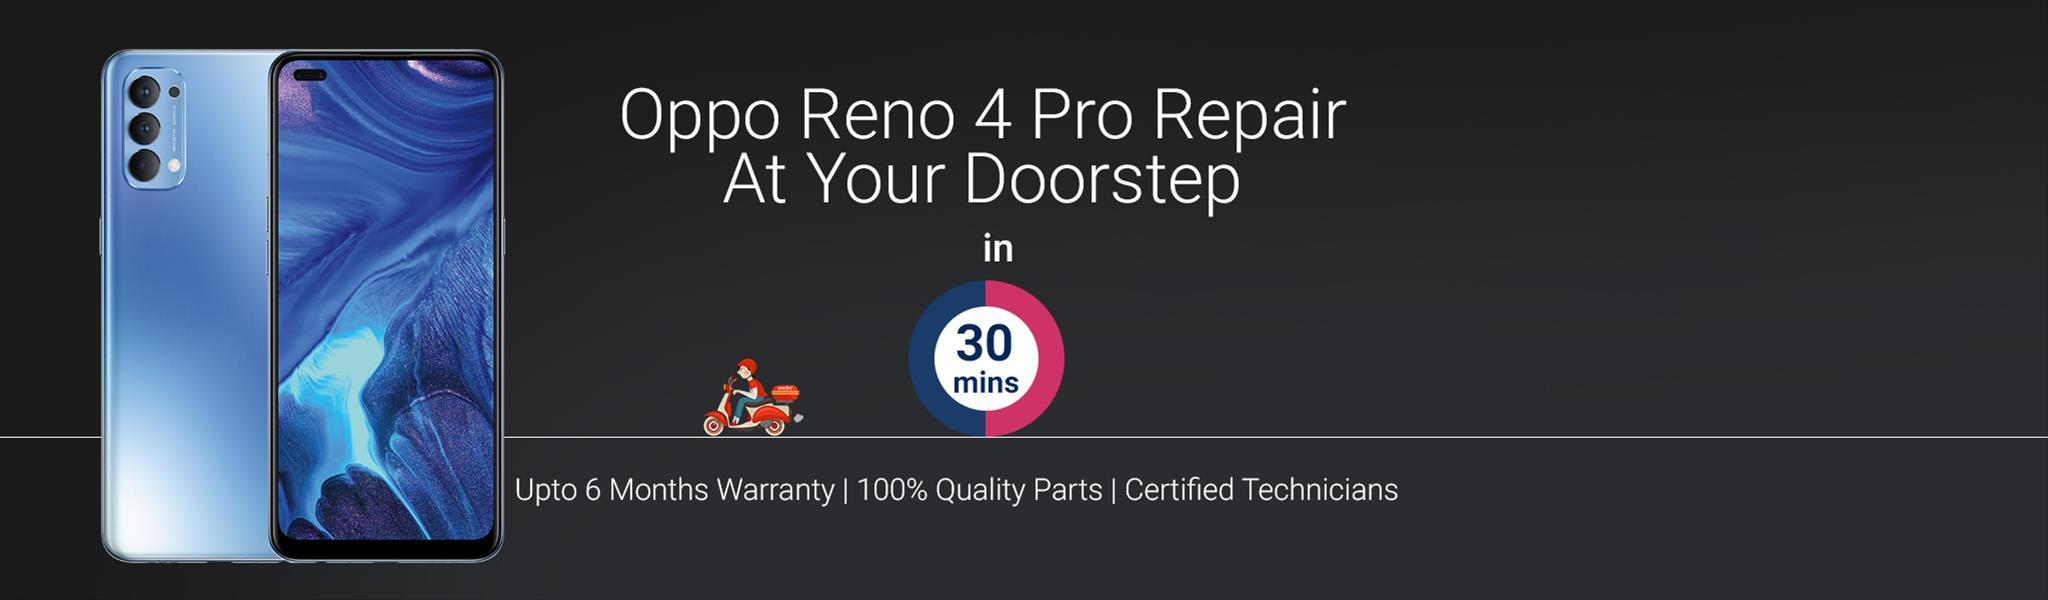 oppo-reno-4-pro-repair.jpg